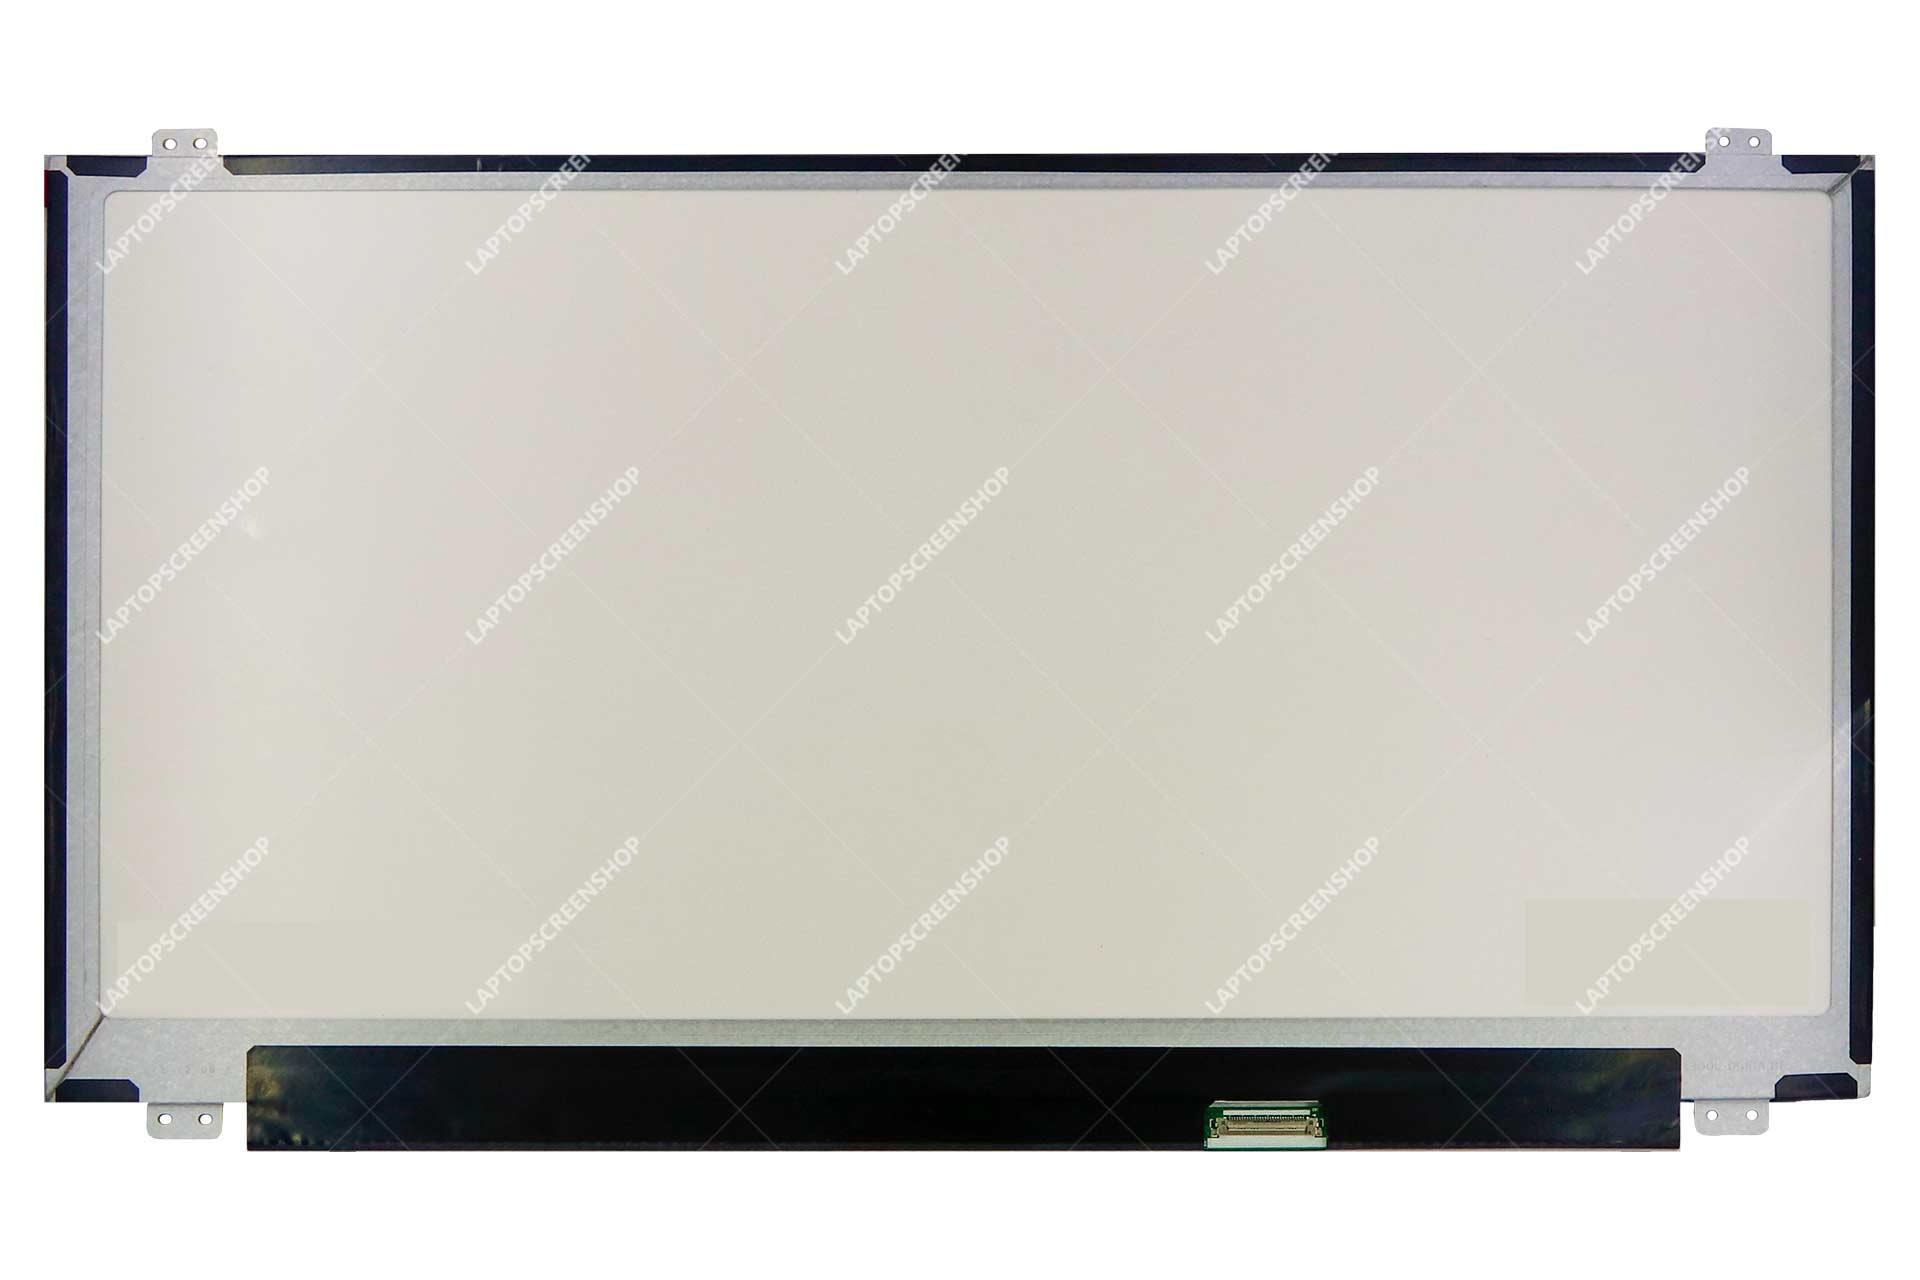 ACER-ASPIRE-E1-532-4866-LCD |HD|فروشگاه لپ تاپ اسکرين | تعمير لپ تاپ